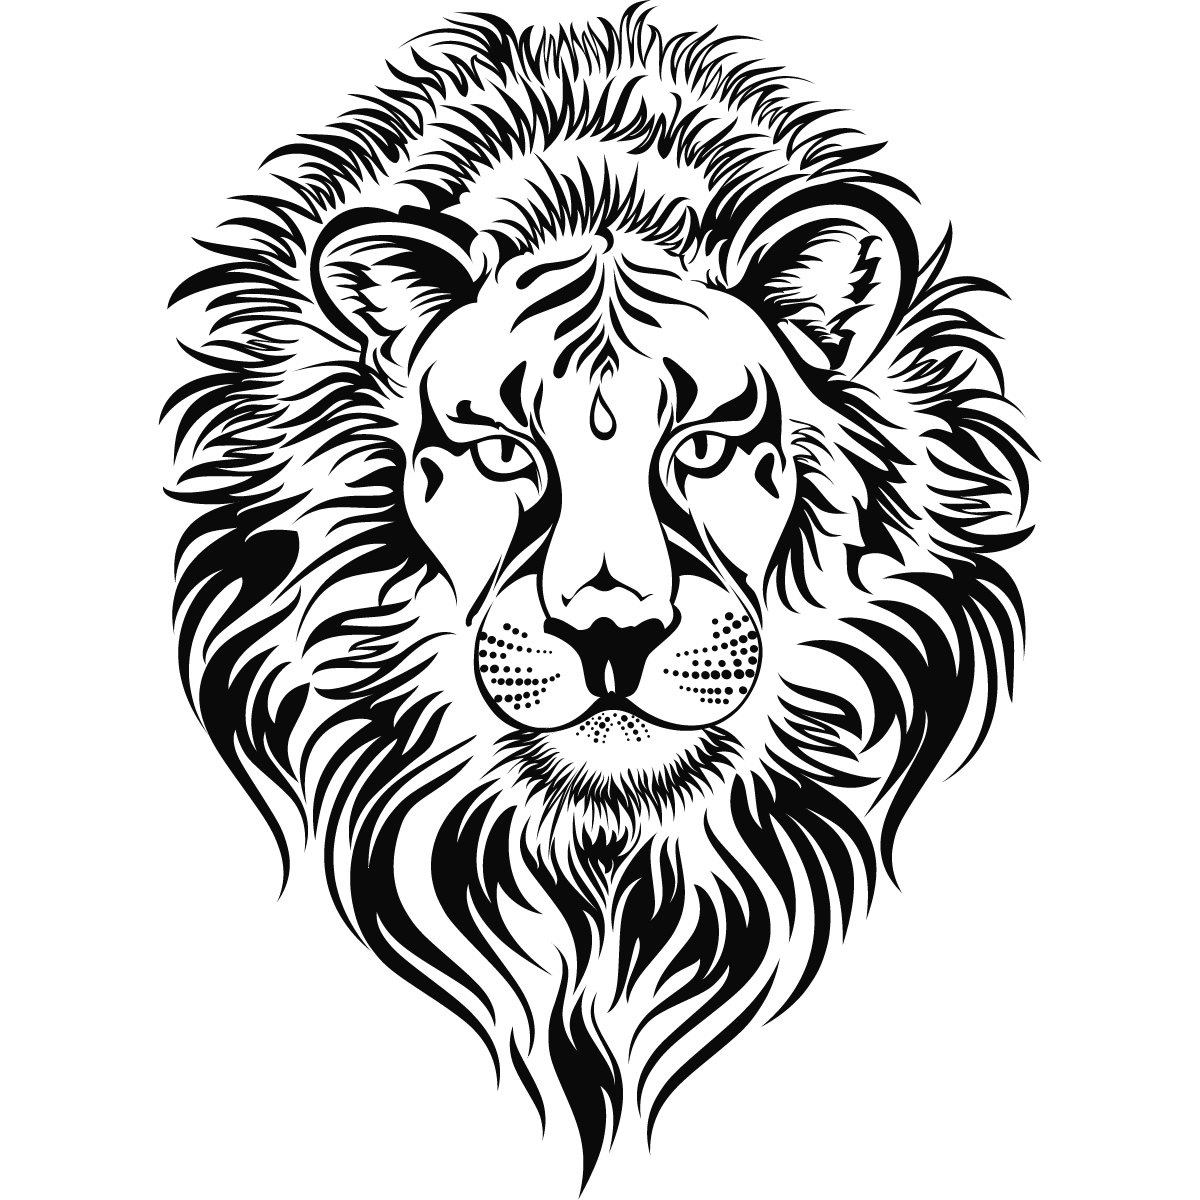 Animals lion face clipart png transparent Free Lion Face Images, Download Free Clip Art, Free Clip Art on ... png transparent